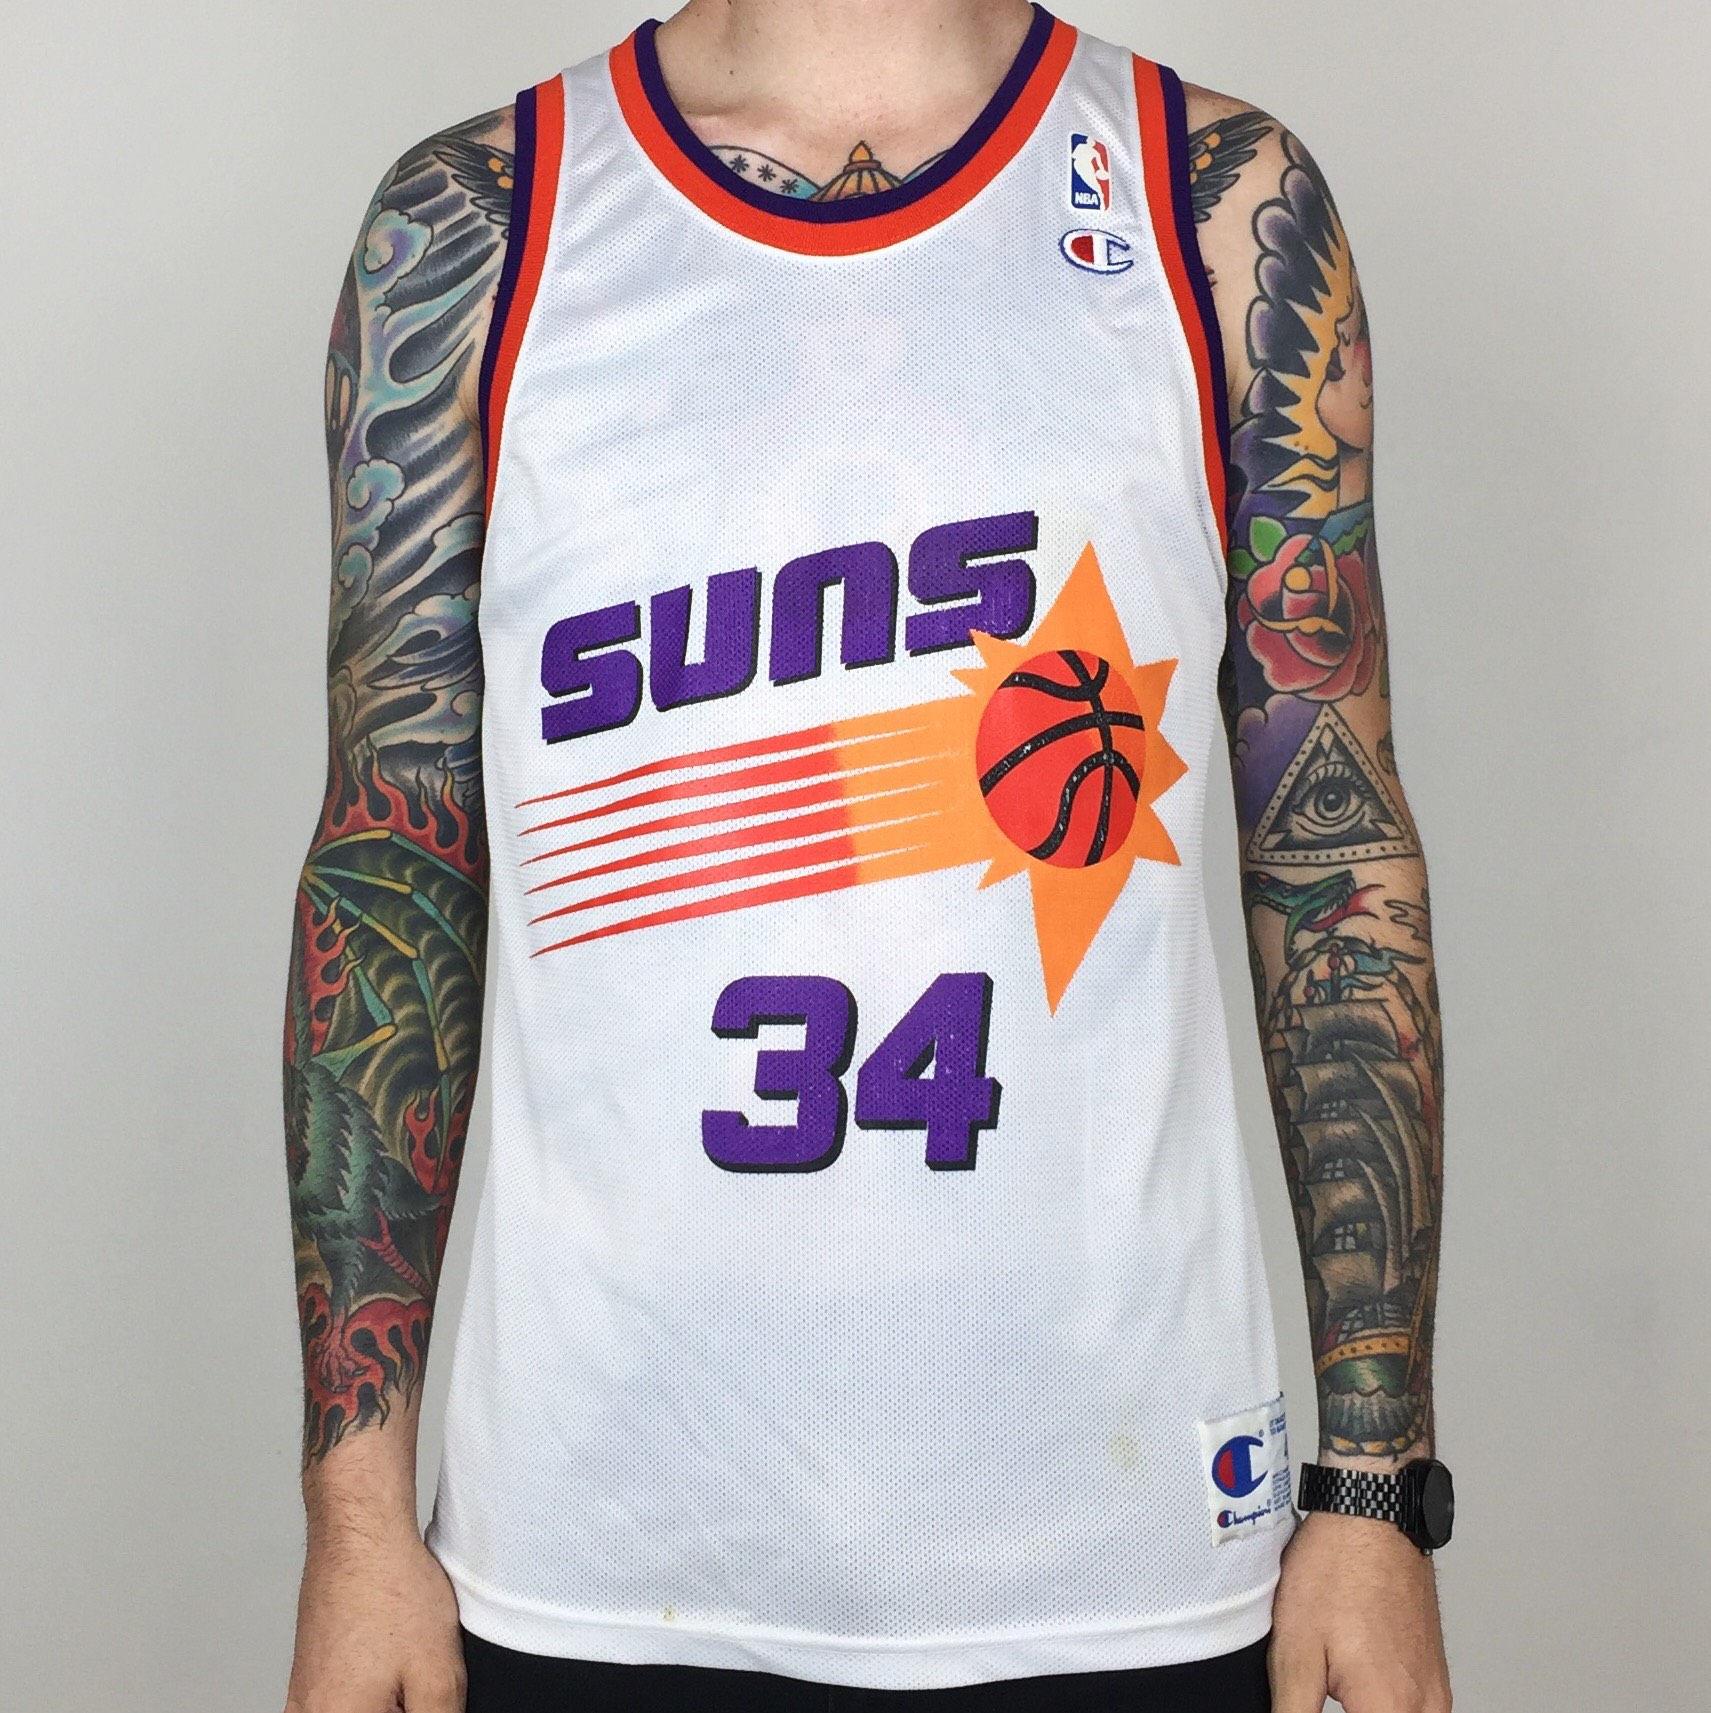 8c5f82b835d Vintage 90s Champion NBA Phoenix Suns Charles Barkley  34 white basketball  jersey - Size 40   M